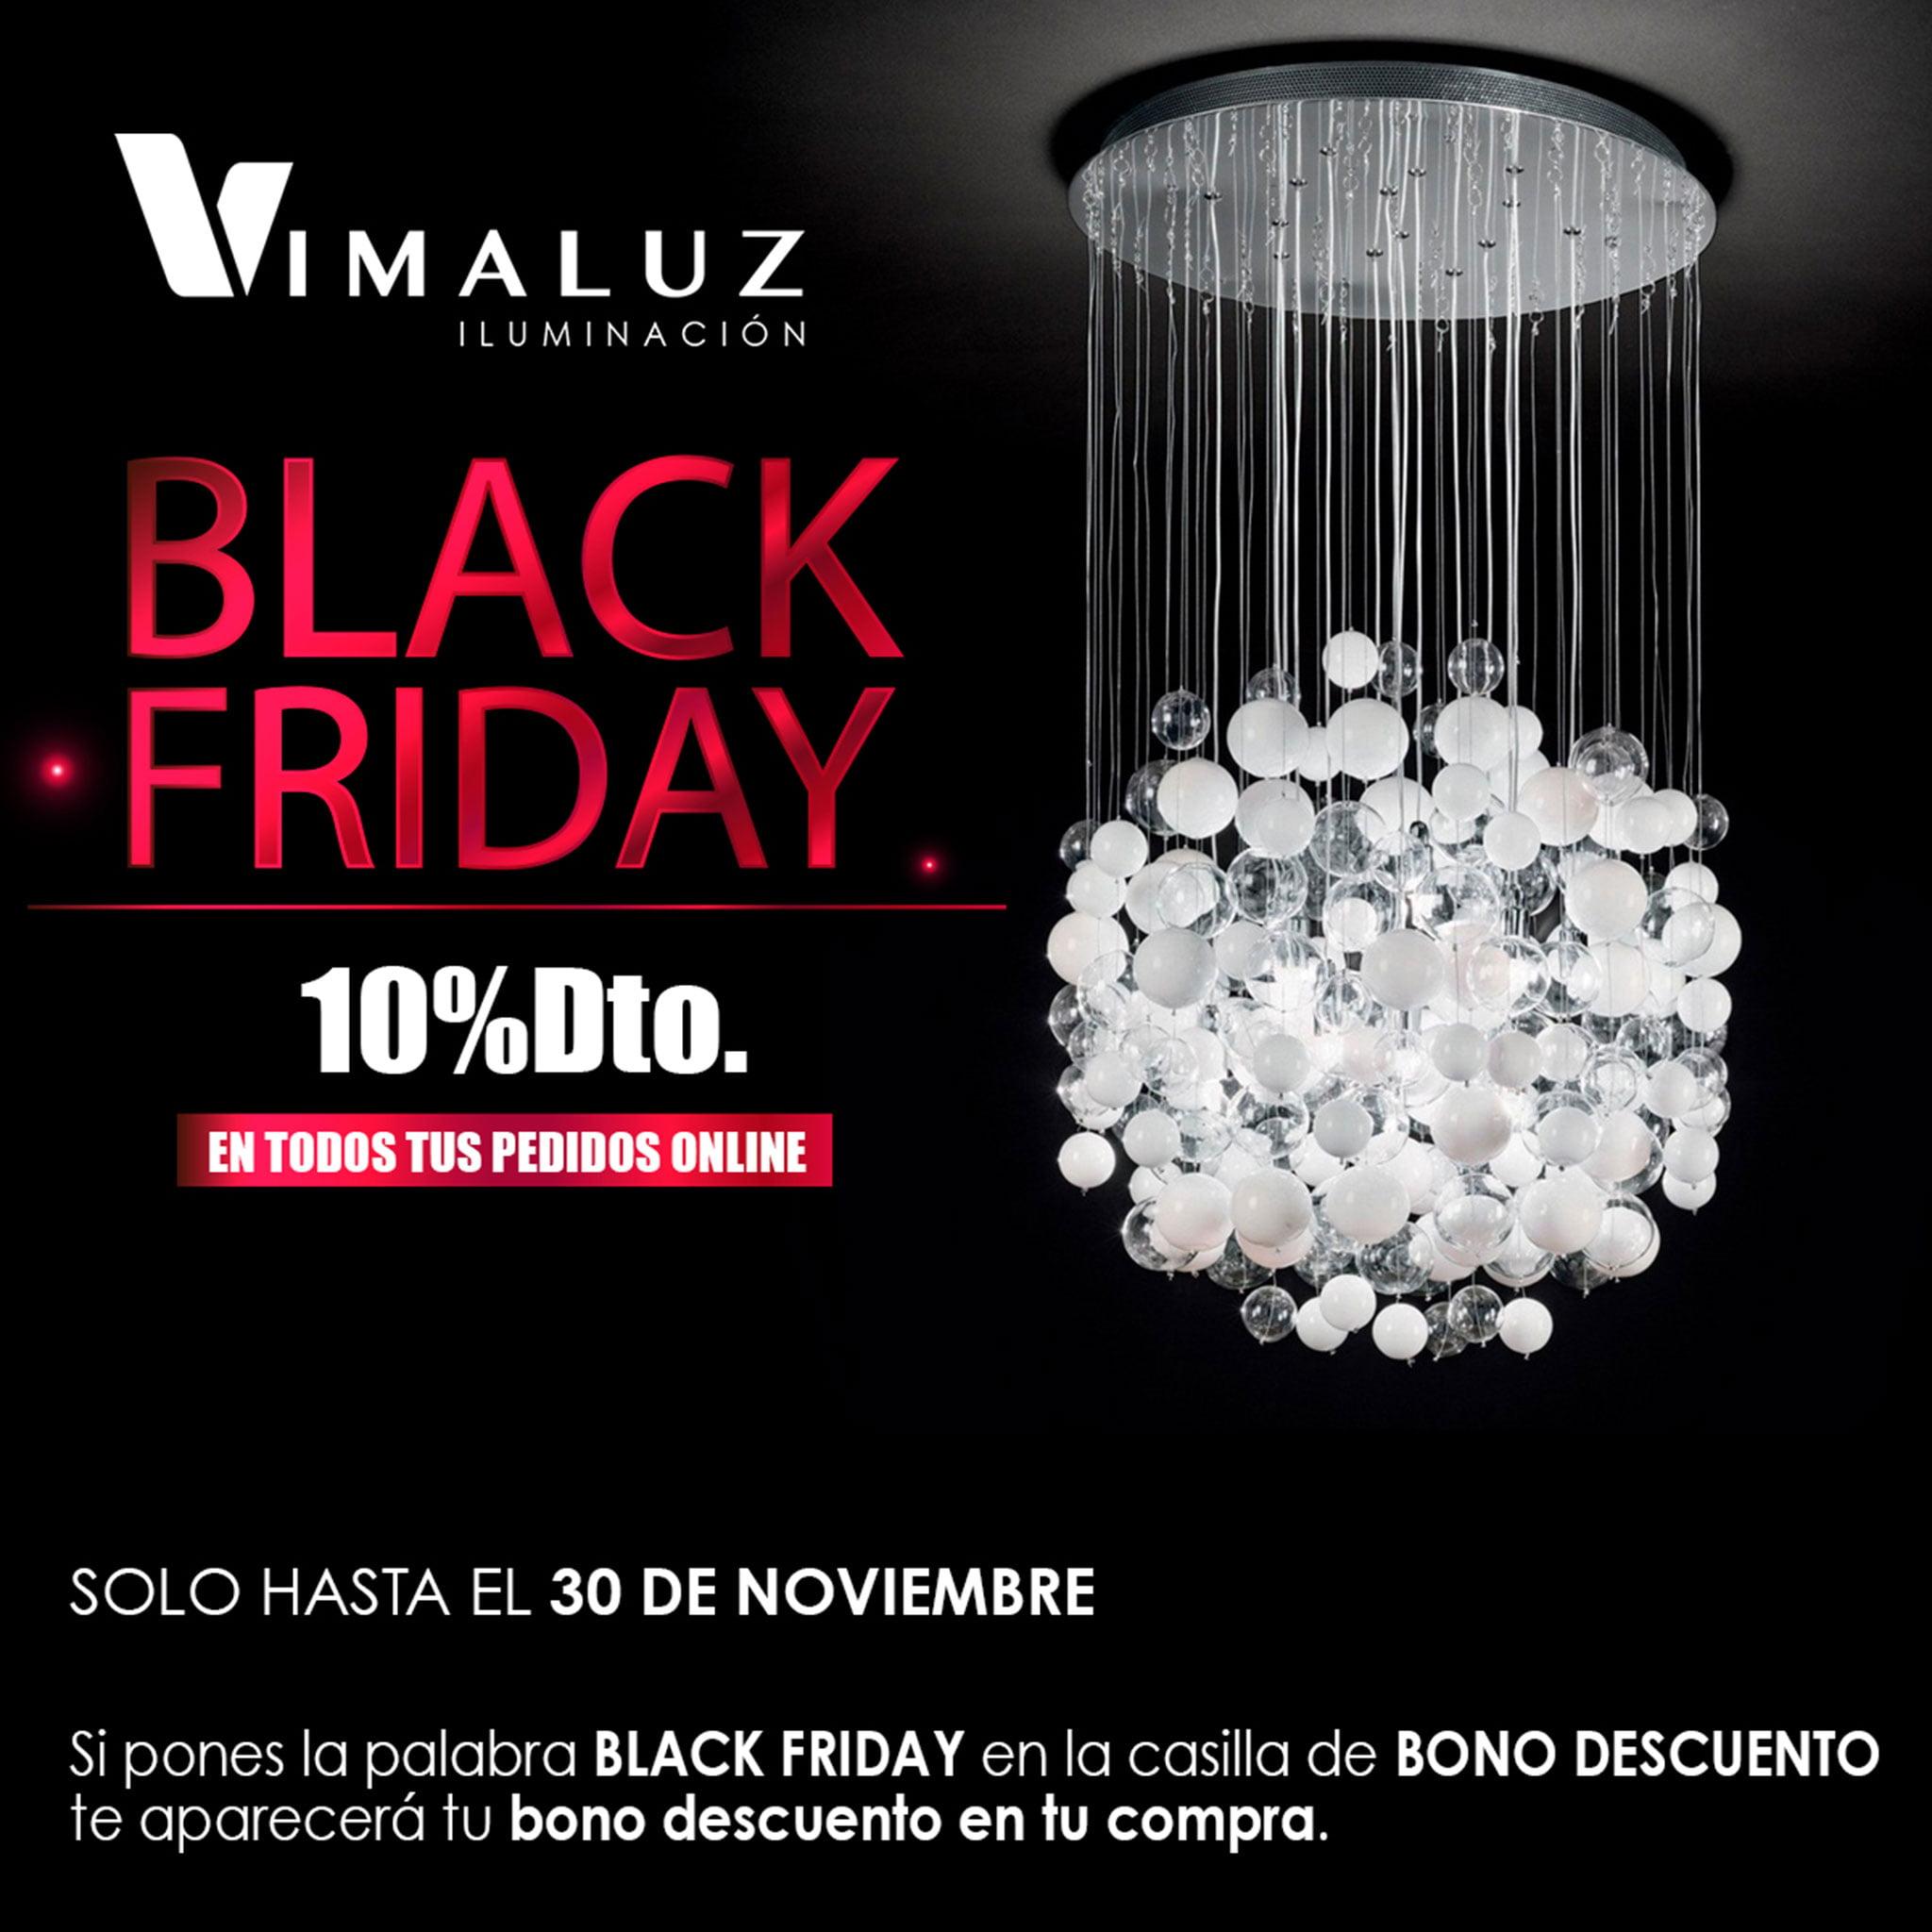 Black Friday d'Vimaluz